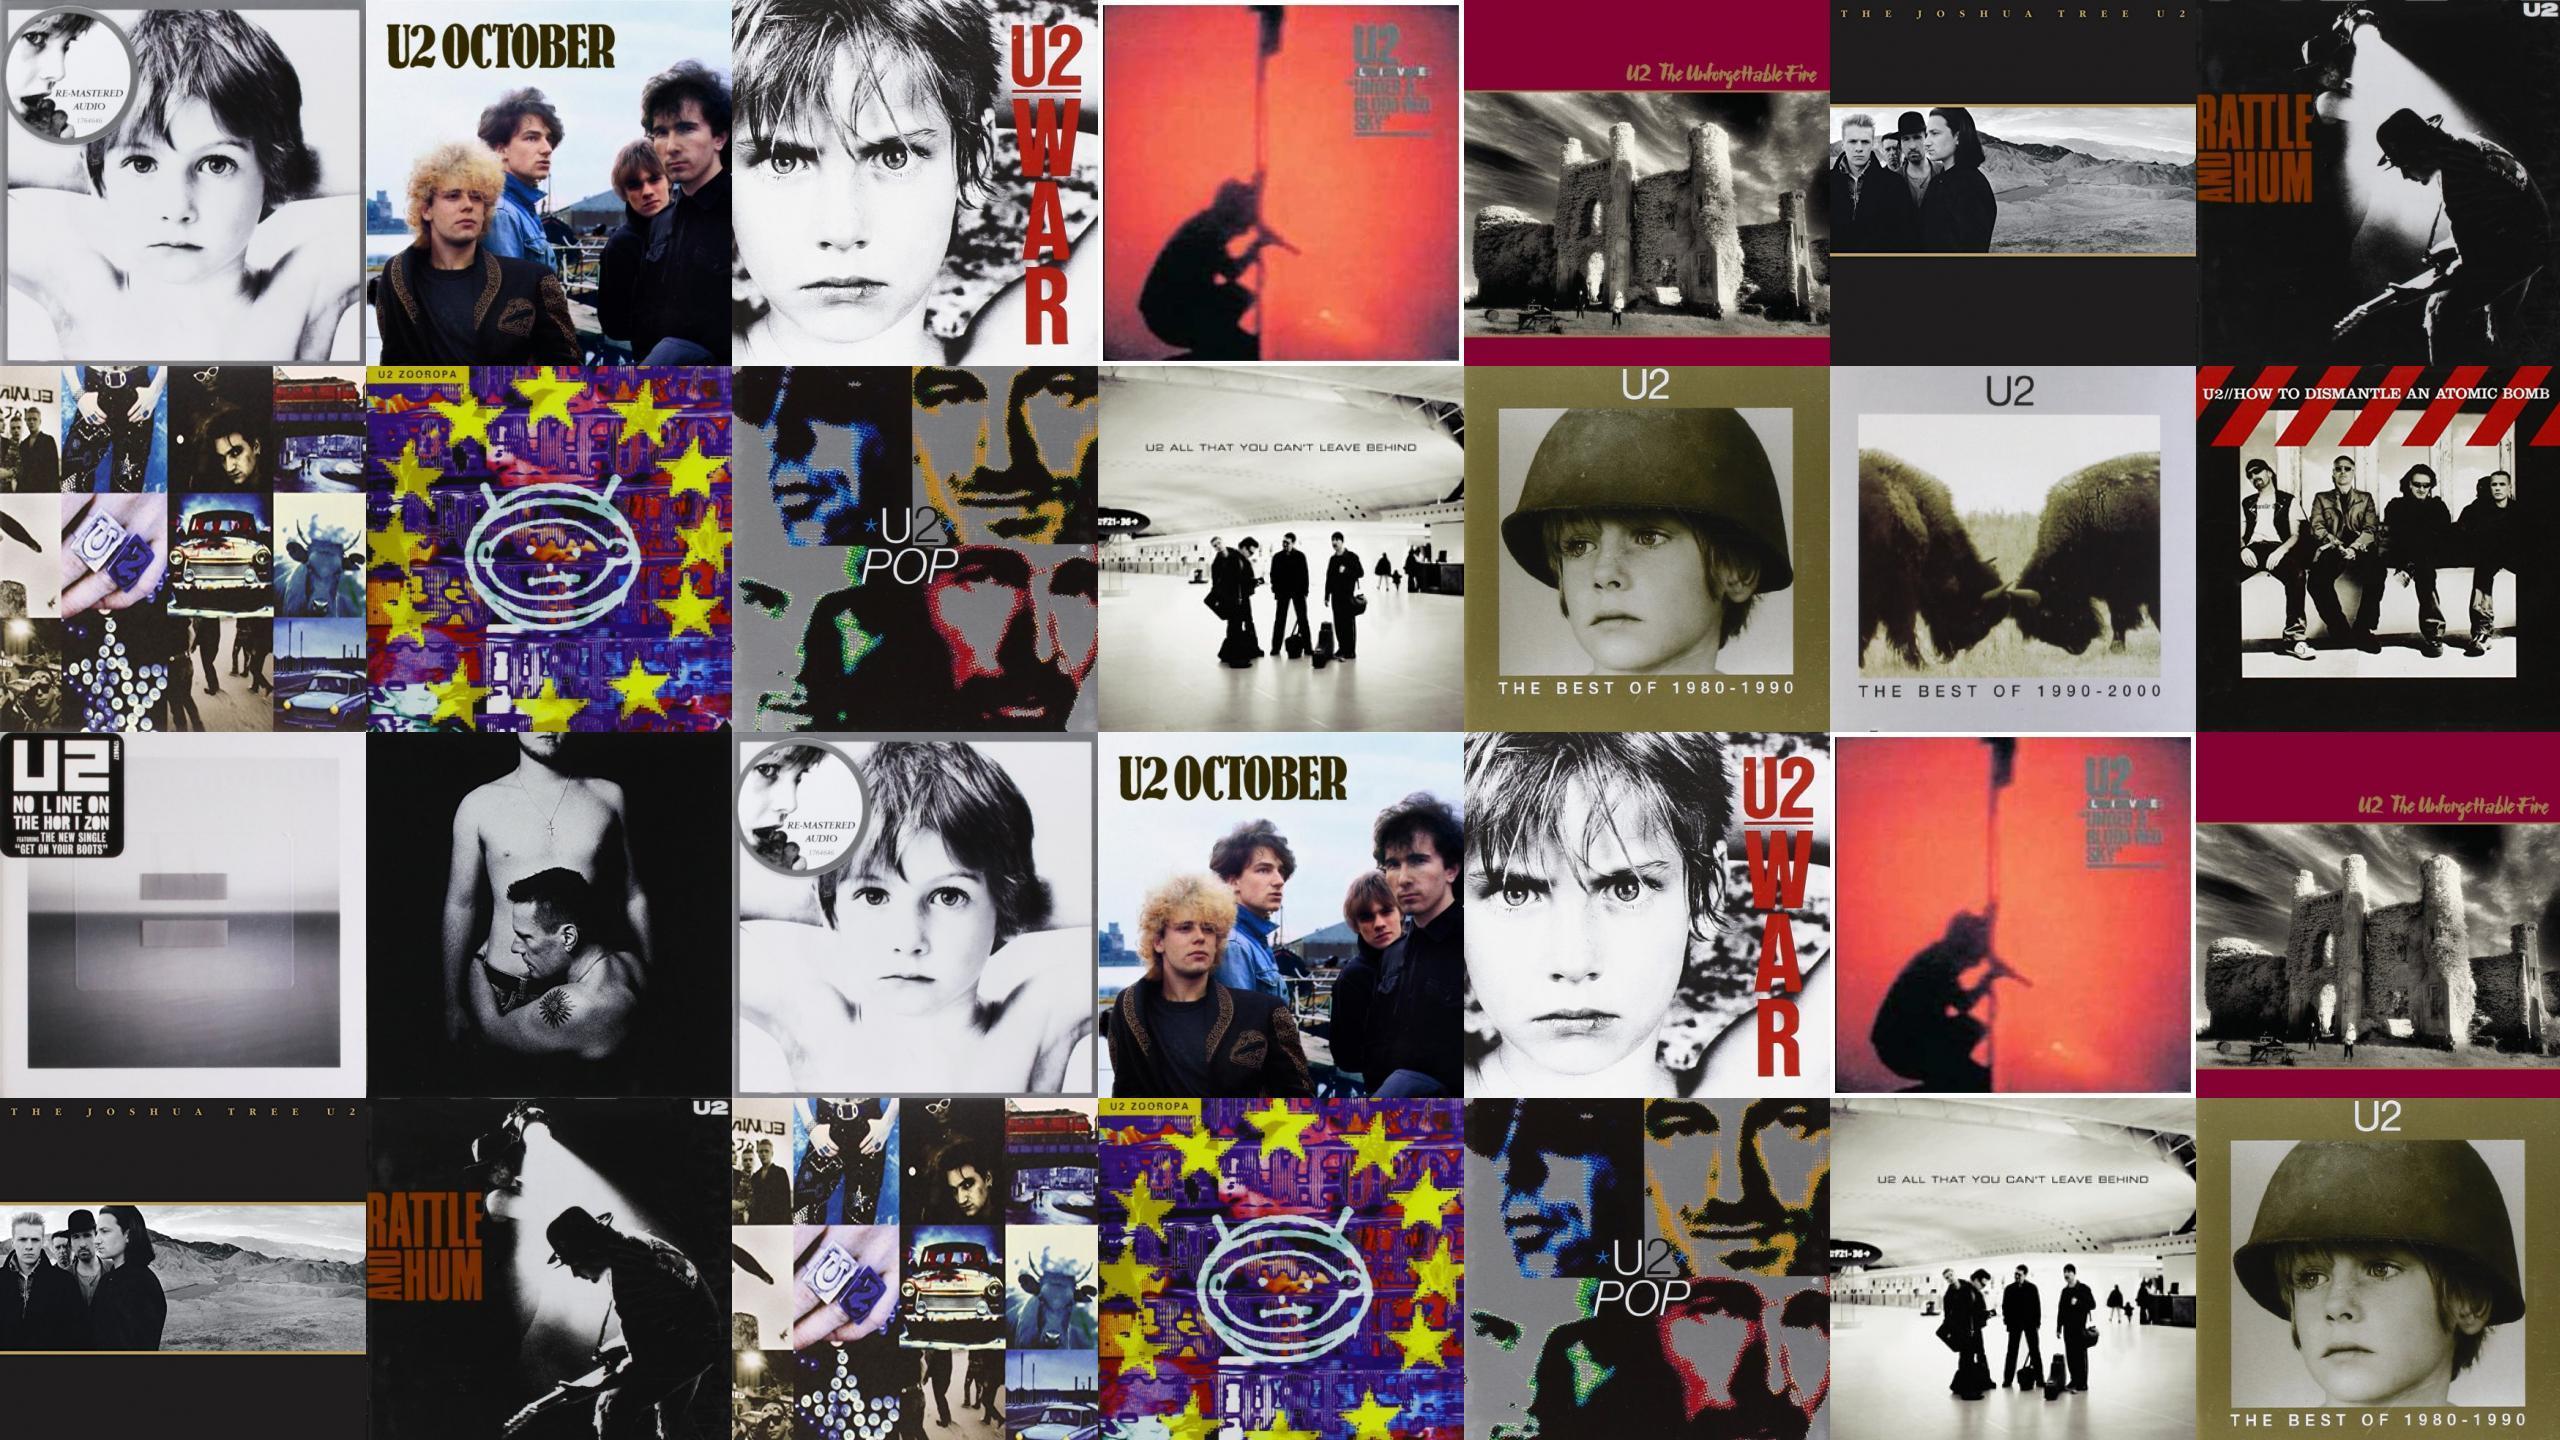 u2 wallpapers hd - photo #34